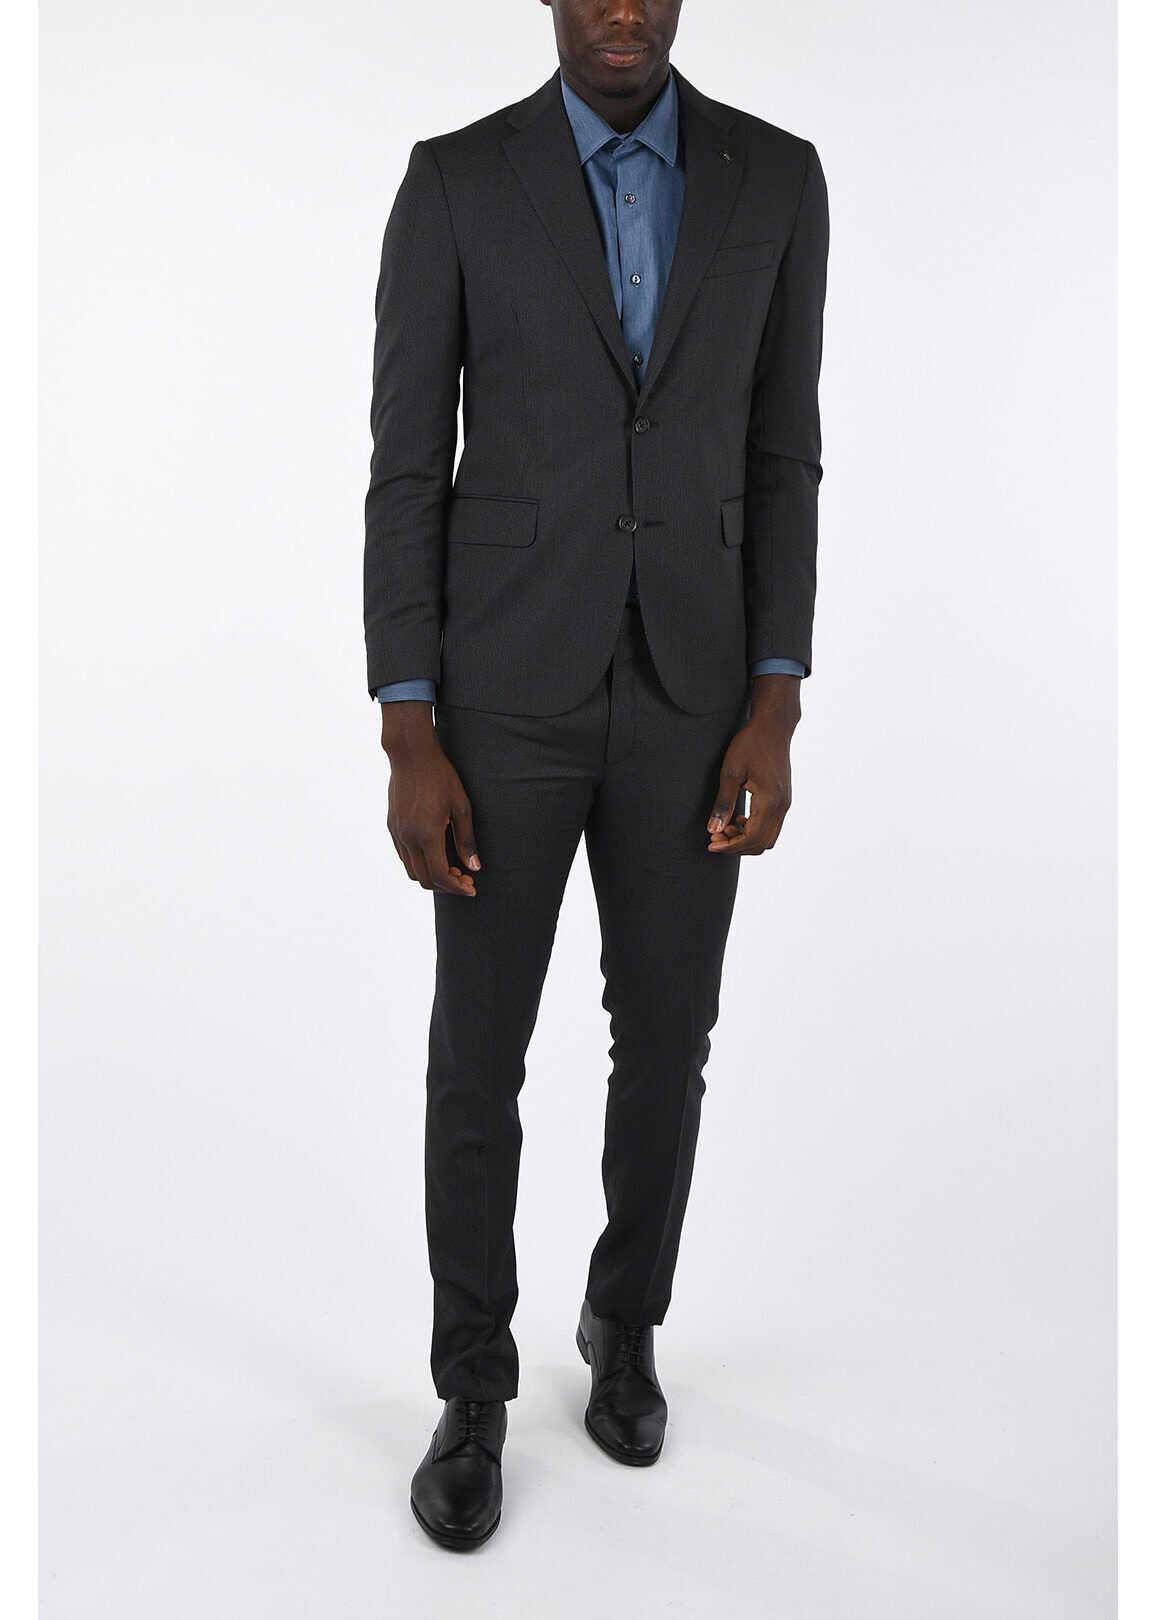 CORNELIANI CC COLLECTION micro pinstriped drop 7 r 2-button suit GRAY imagine